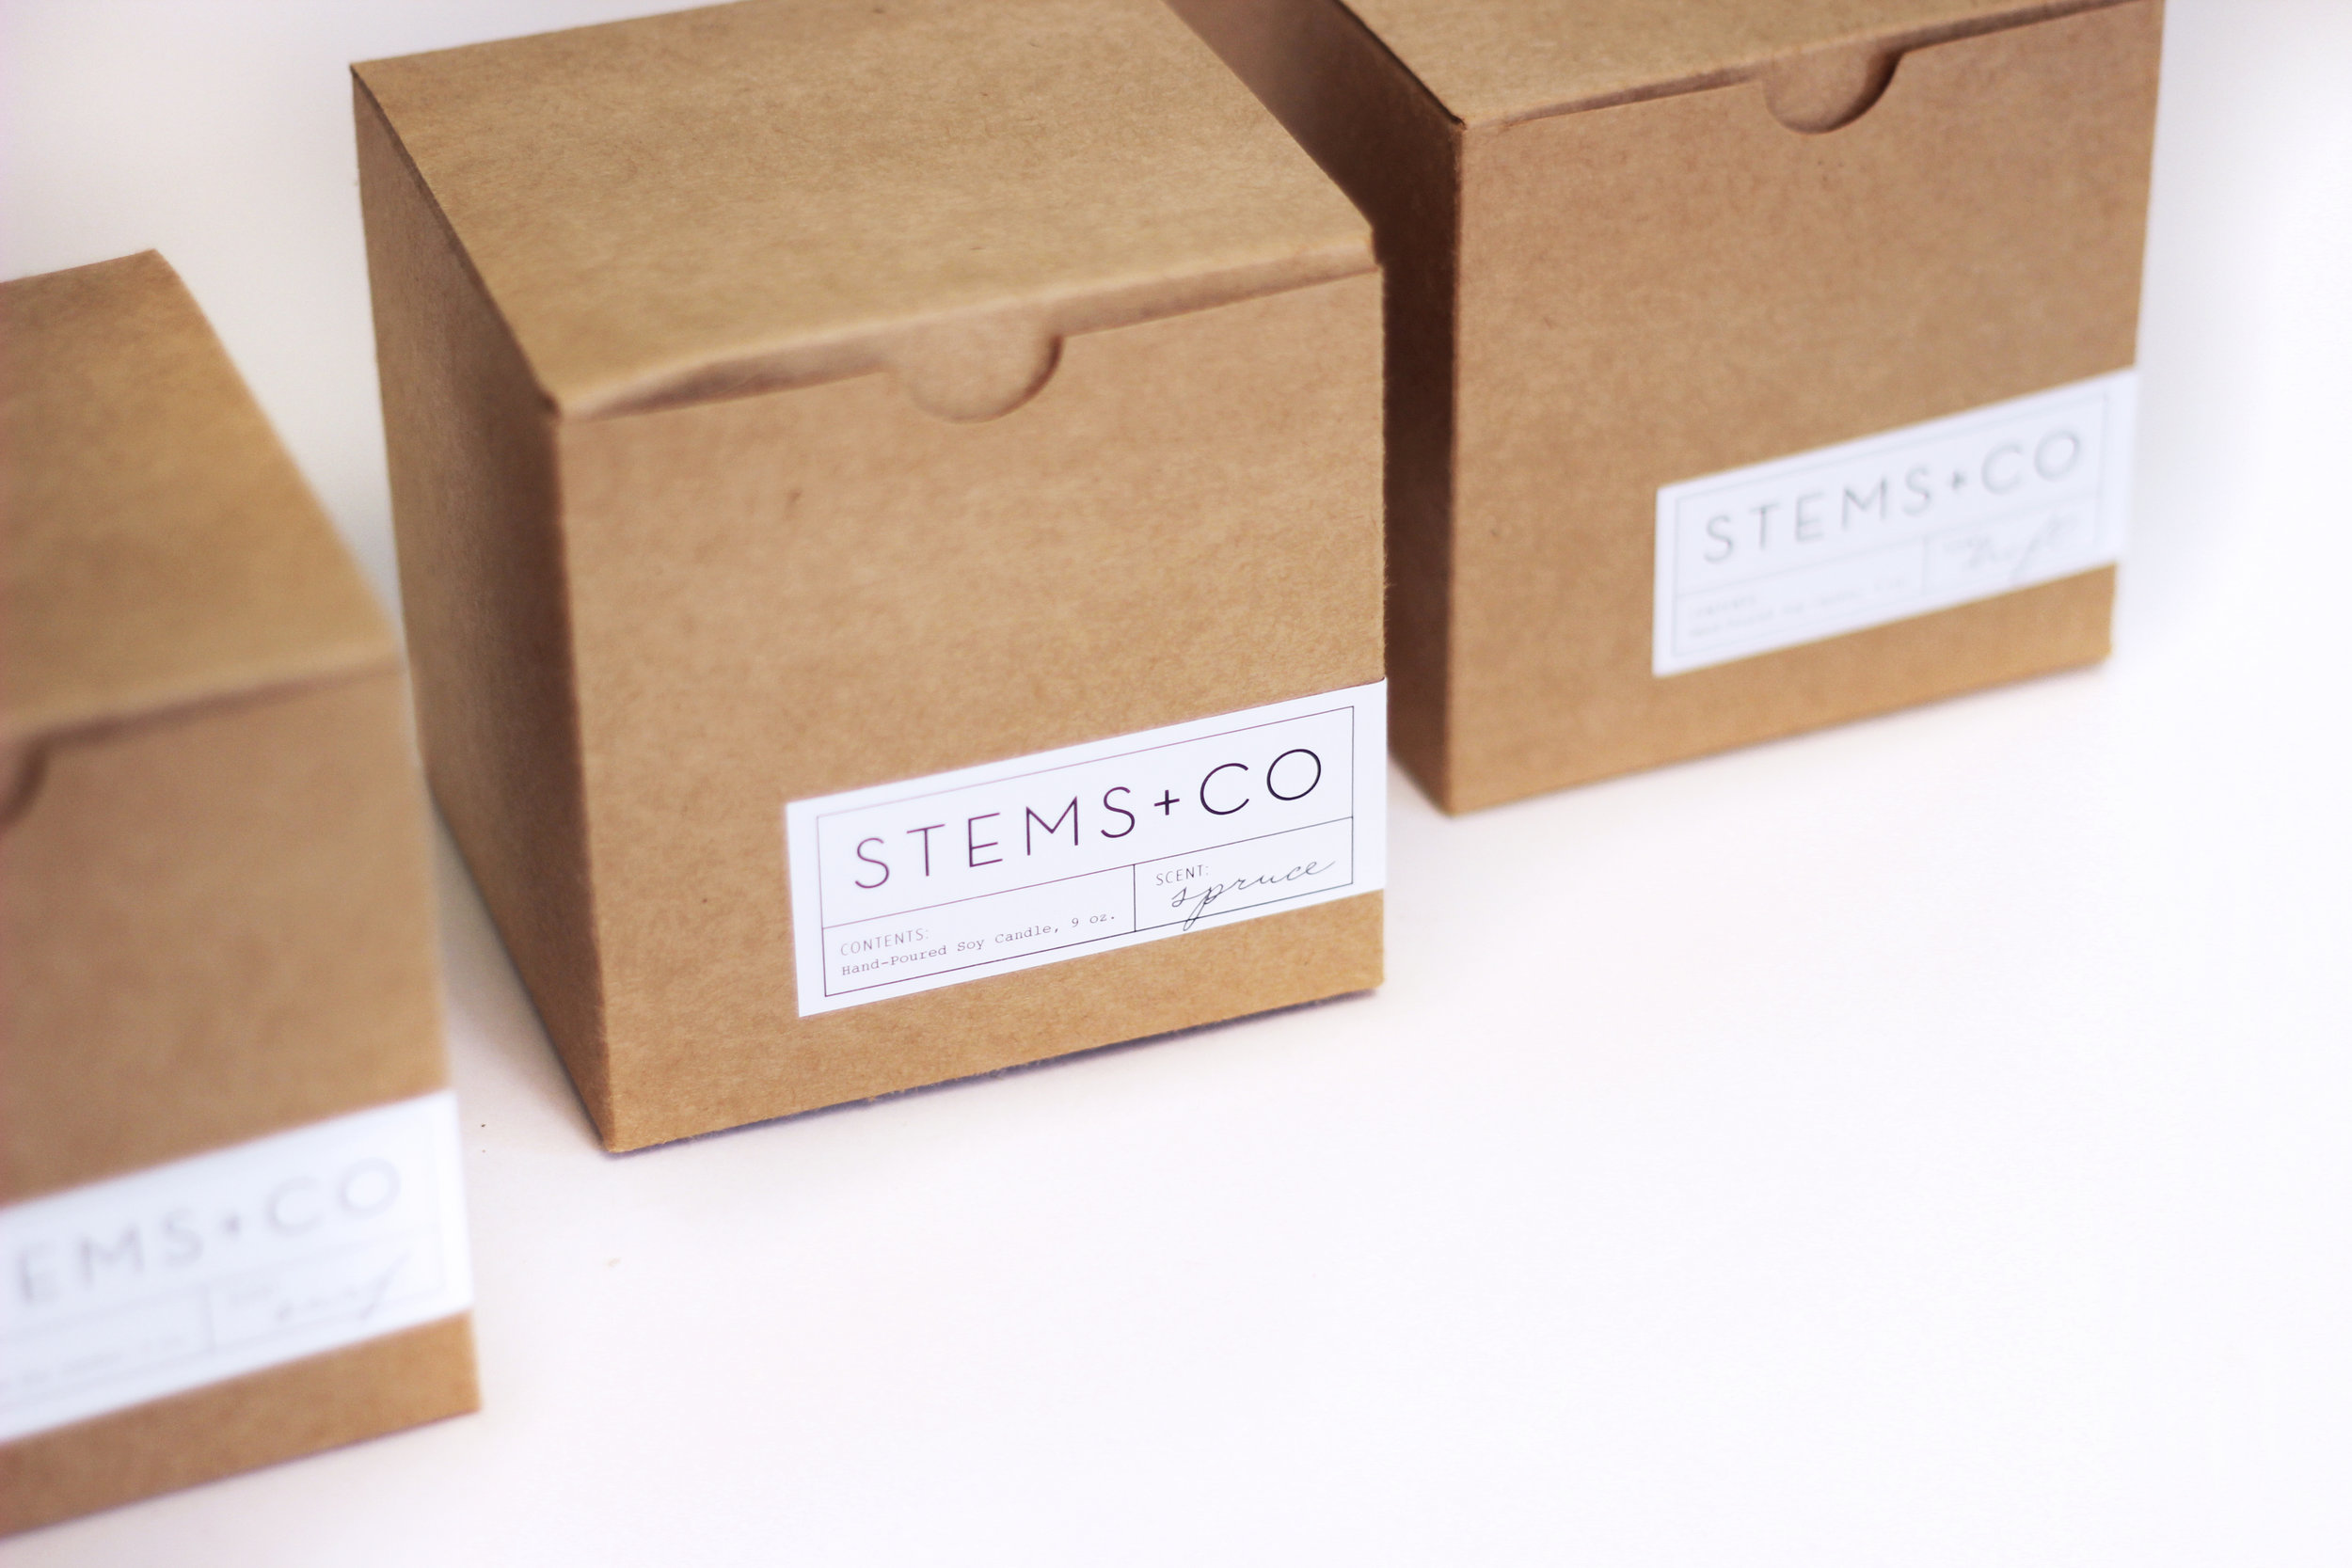 Stems+Co_Candles_10.jpg